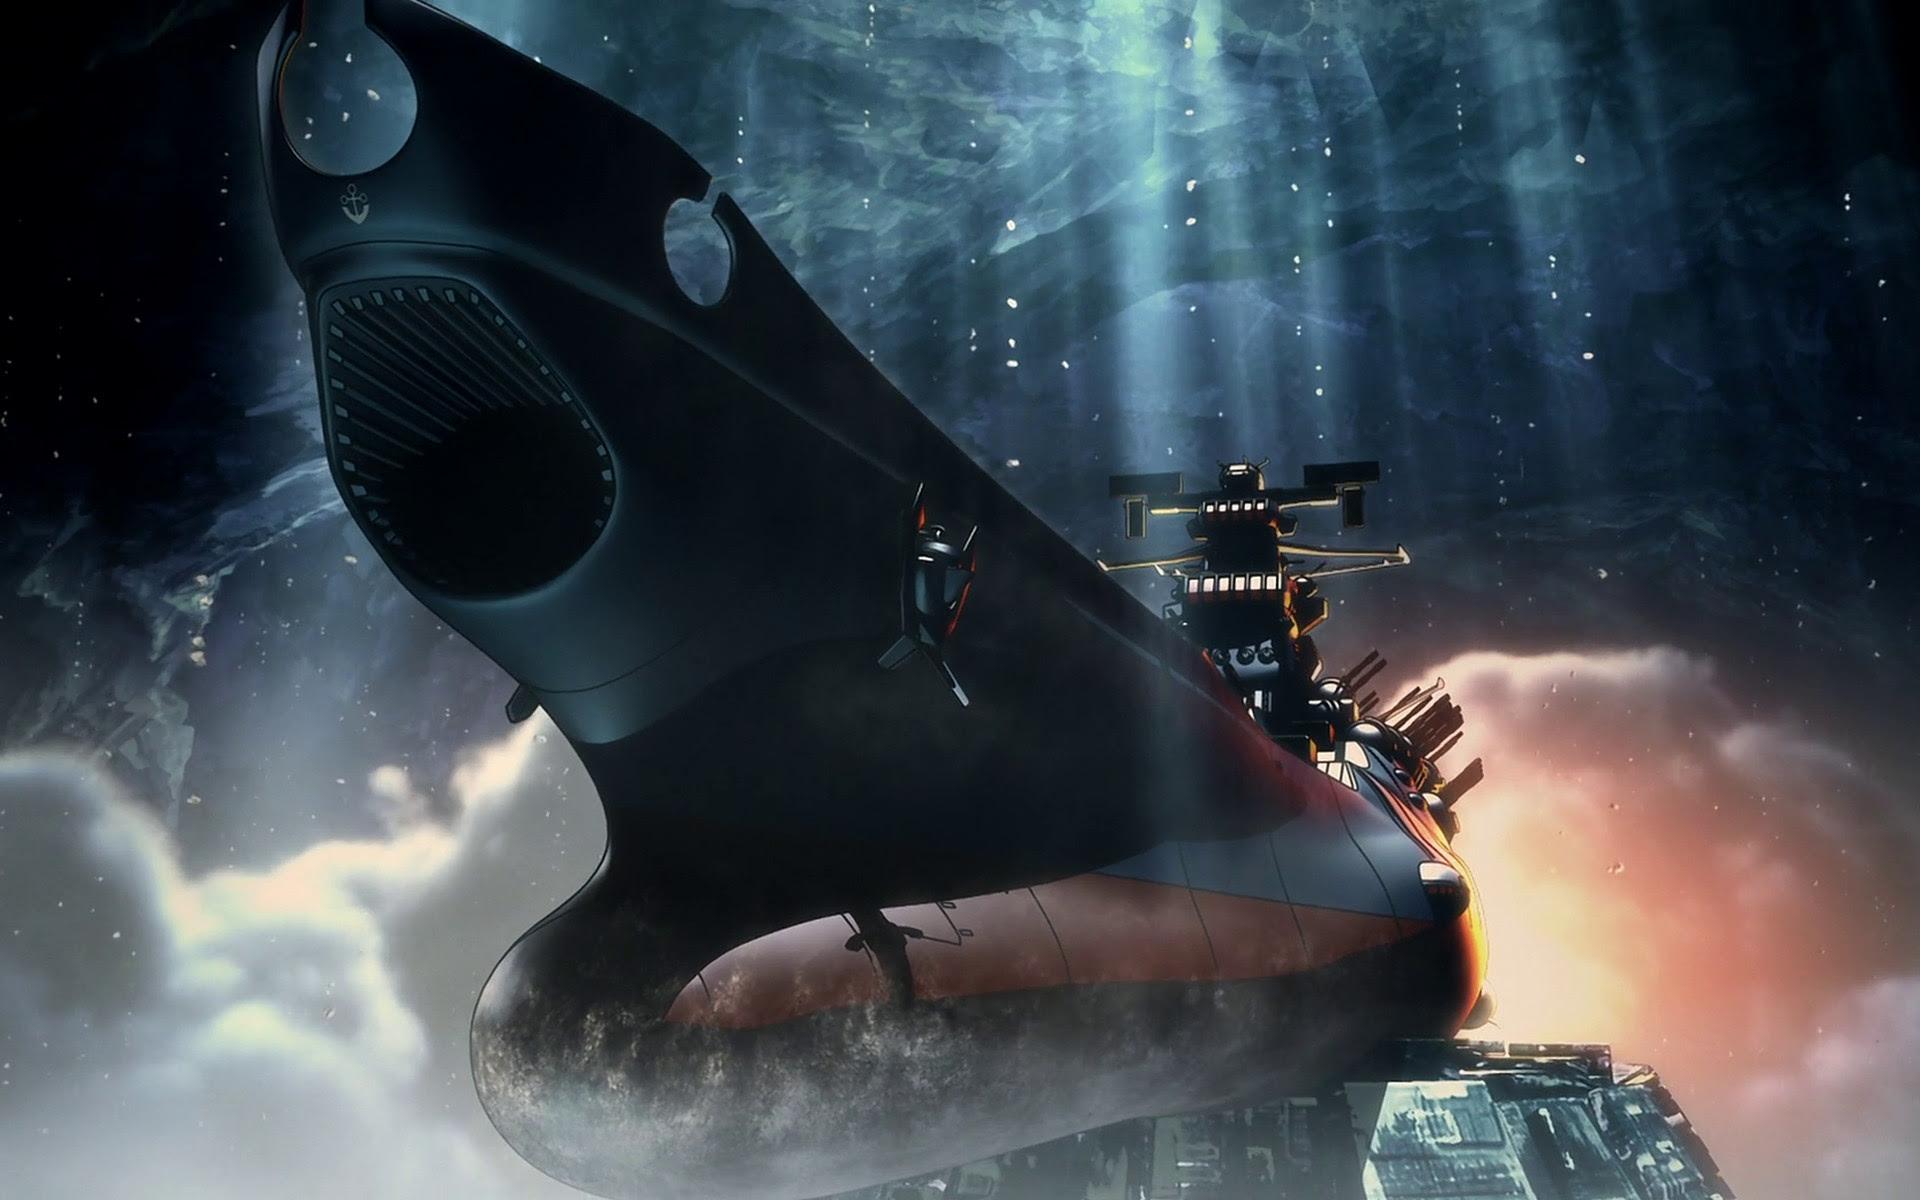 Space Battleship Yamato 2199 Wallpaper 86 Images